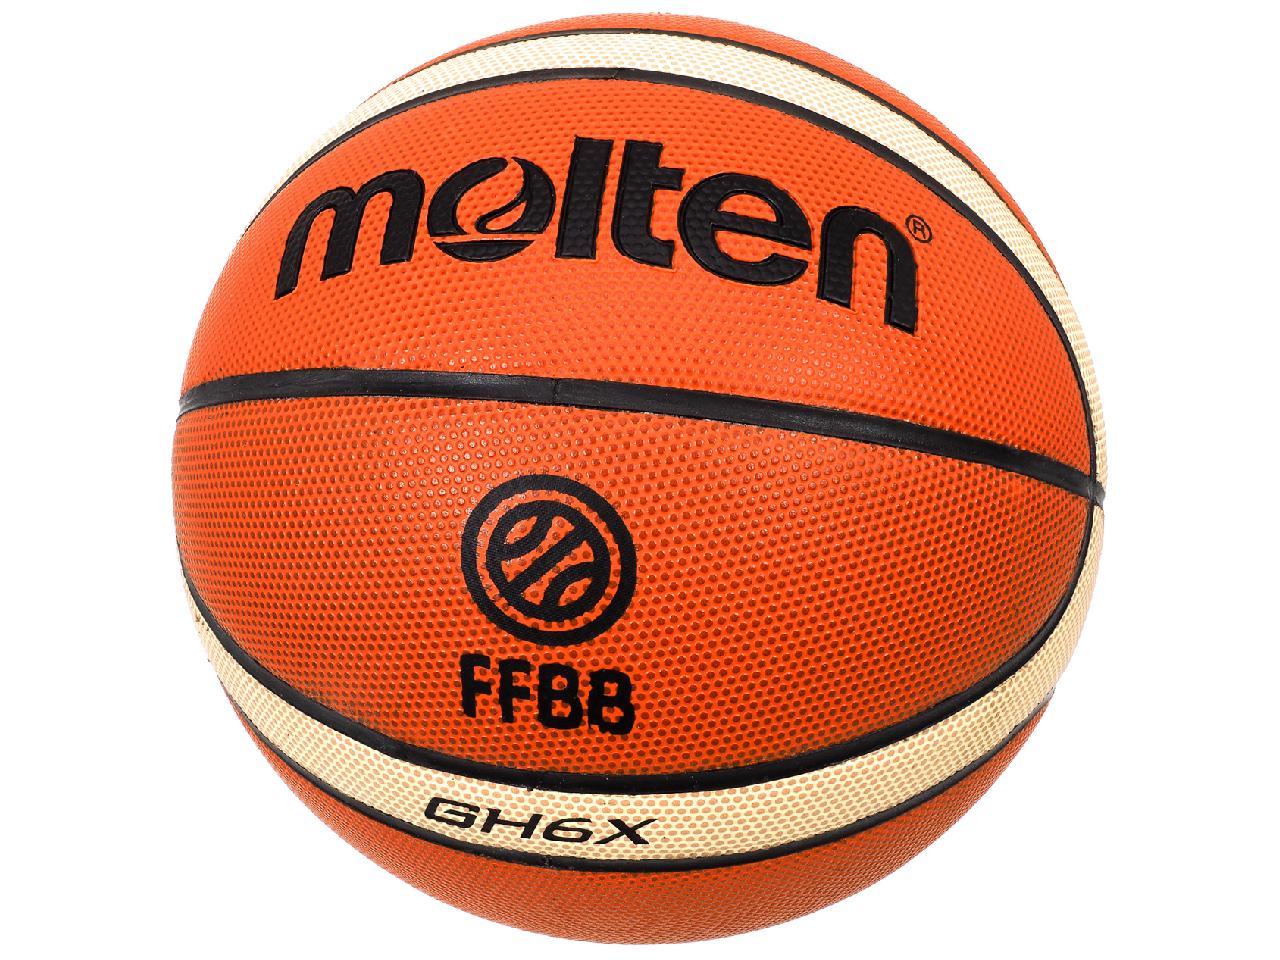 Ball-Of-Basketball-Molten-Gh6x-Training-Indoor-Orange-41622-New thumbnail 4